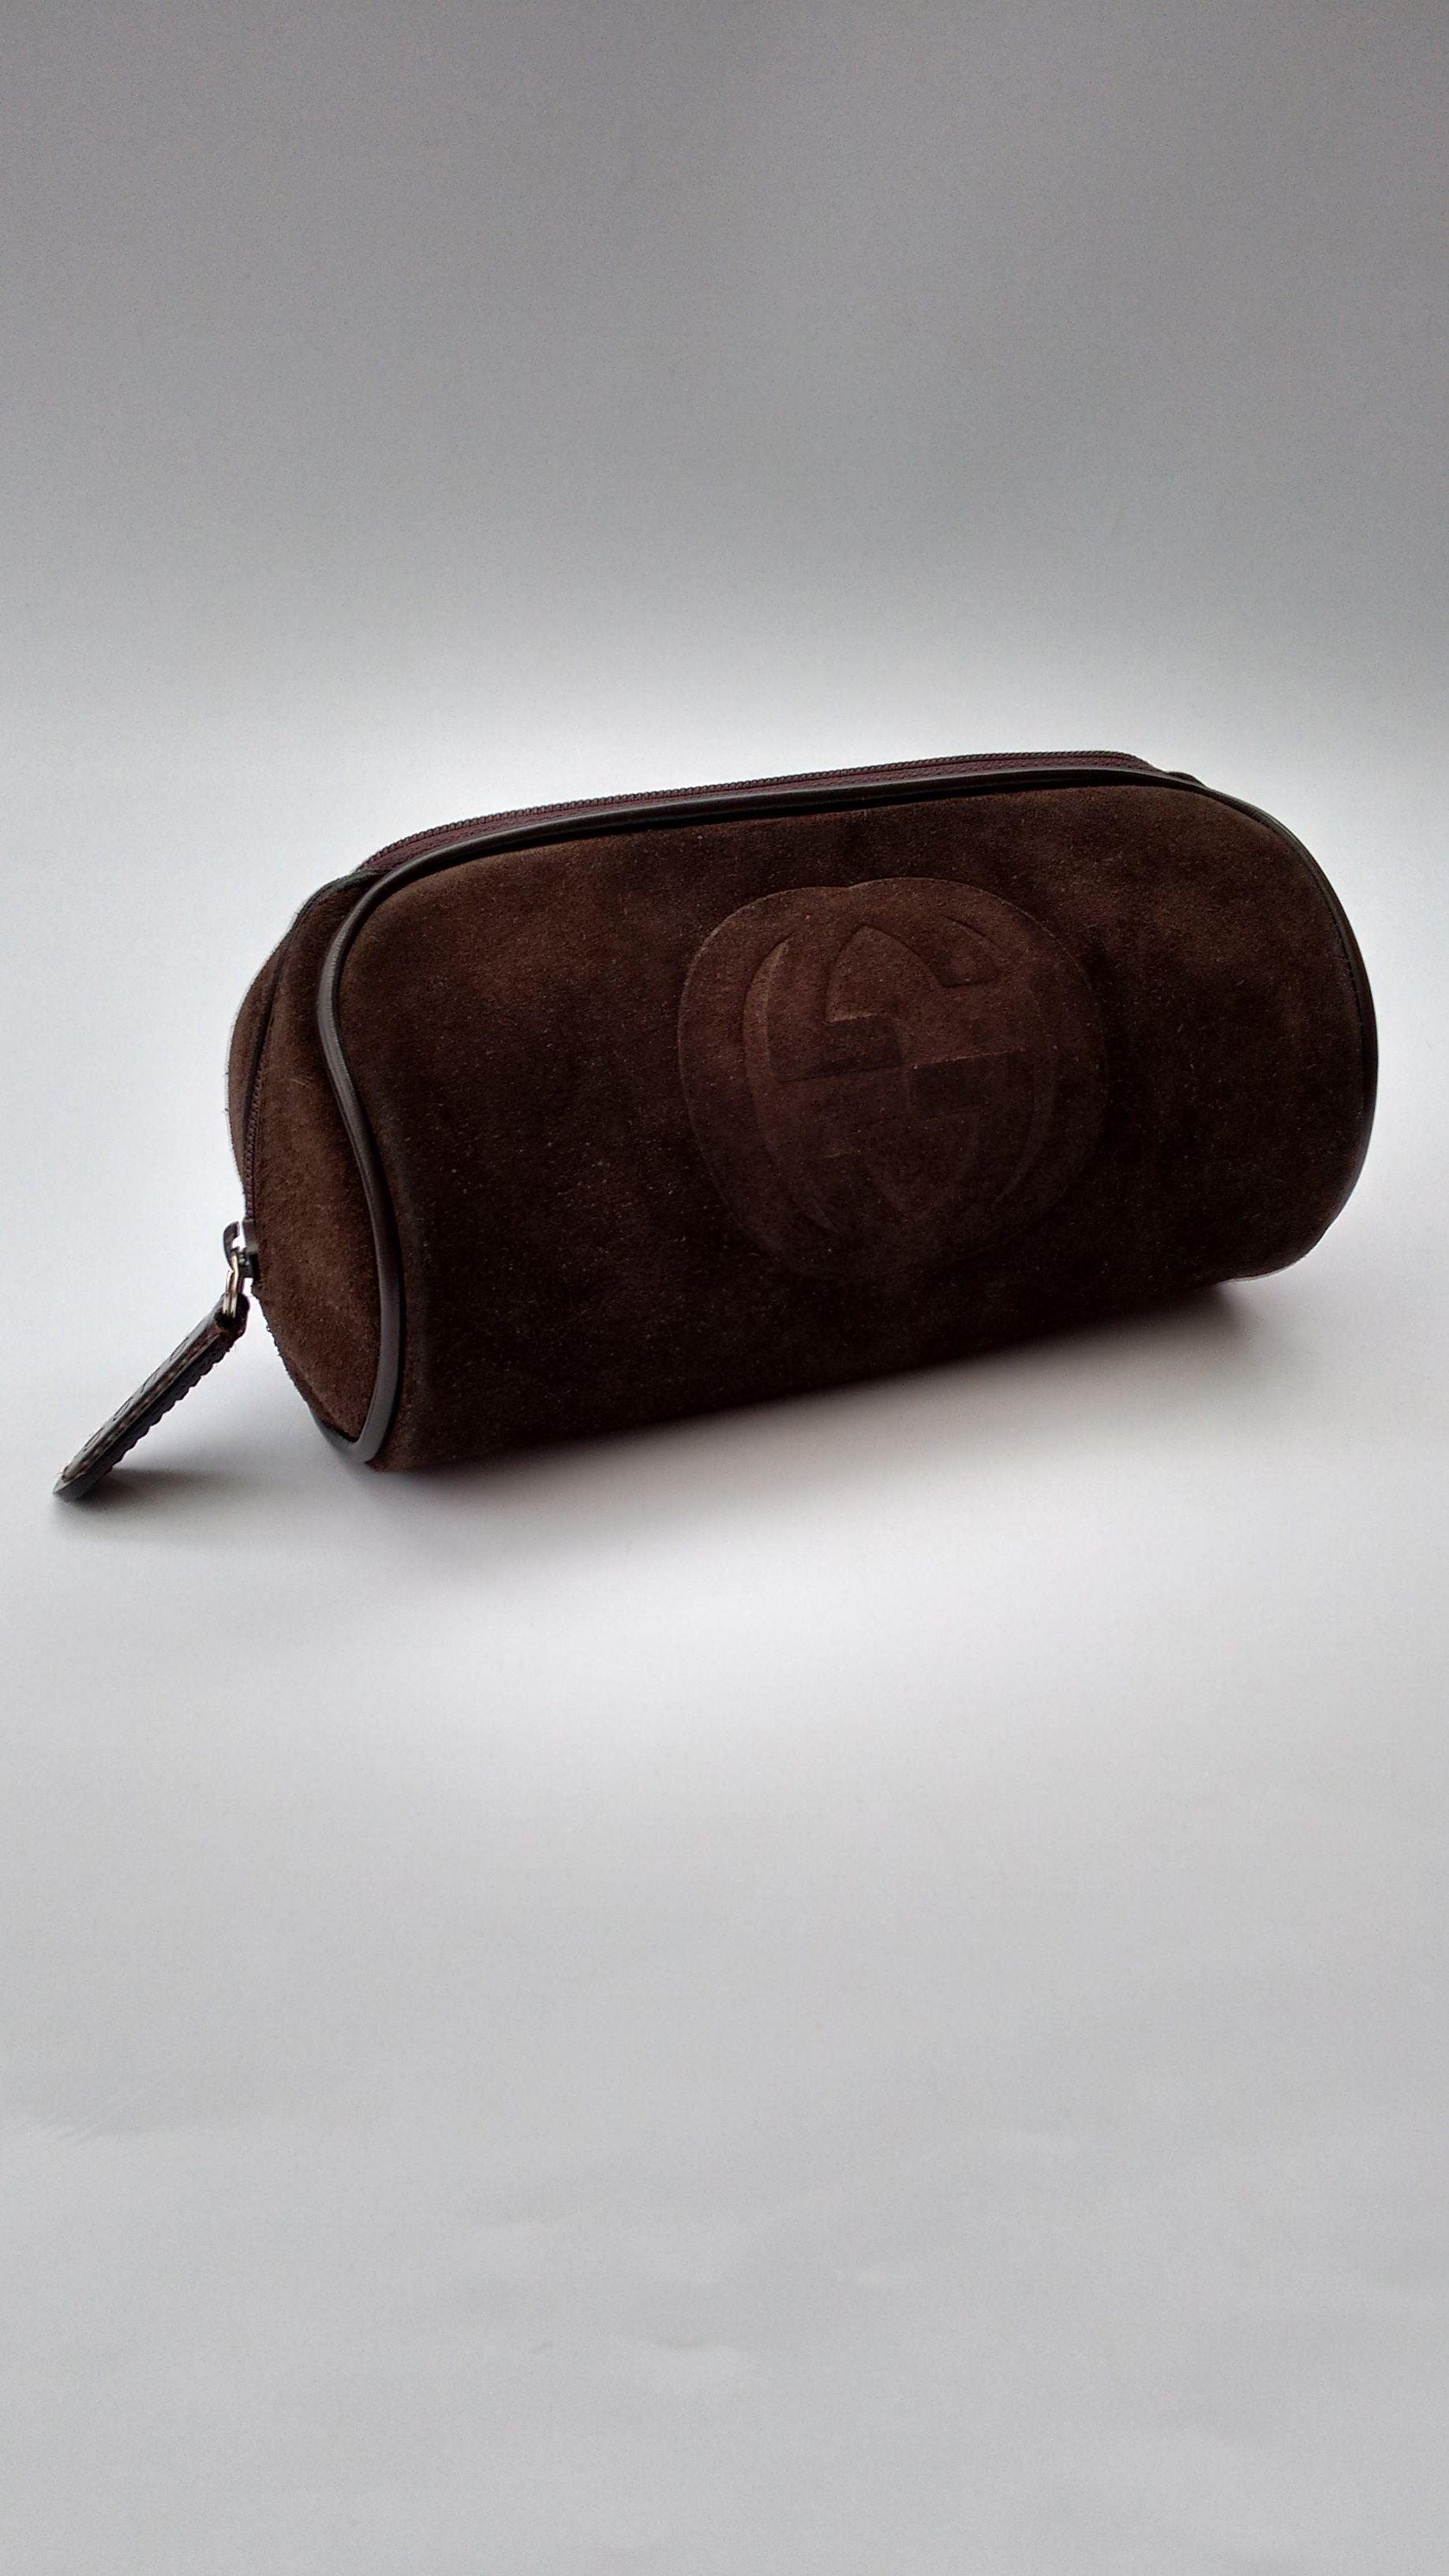 924257d2a0a6 GUCCI Purse. Gucci Vintage Brown Suede Leather Clutch / Cosmetic Bag.  Italian Designer Purse.